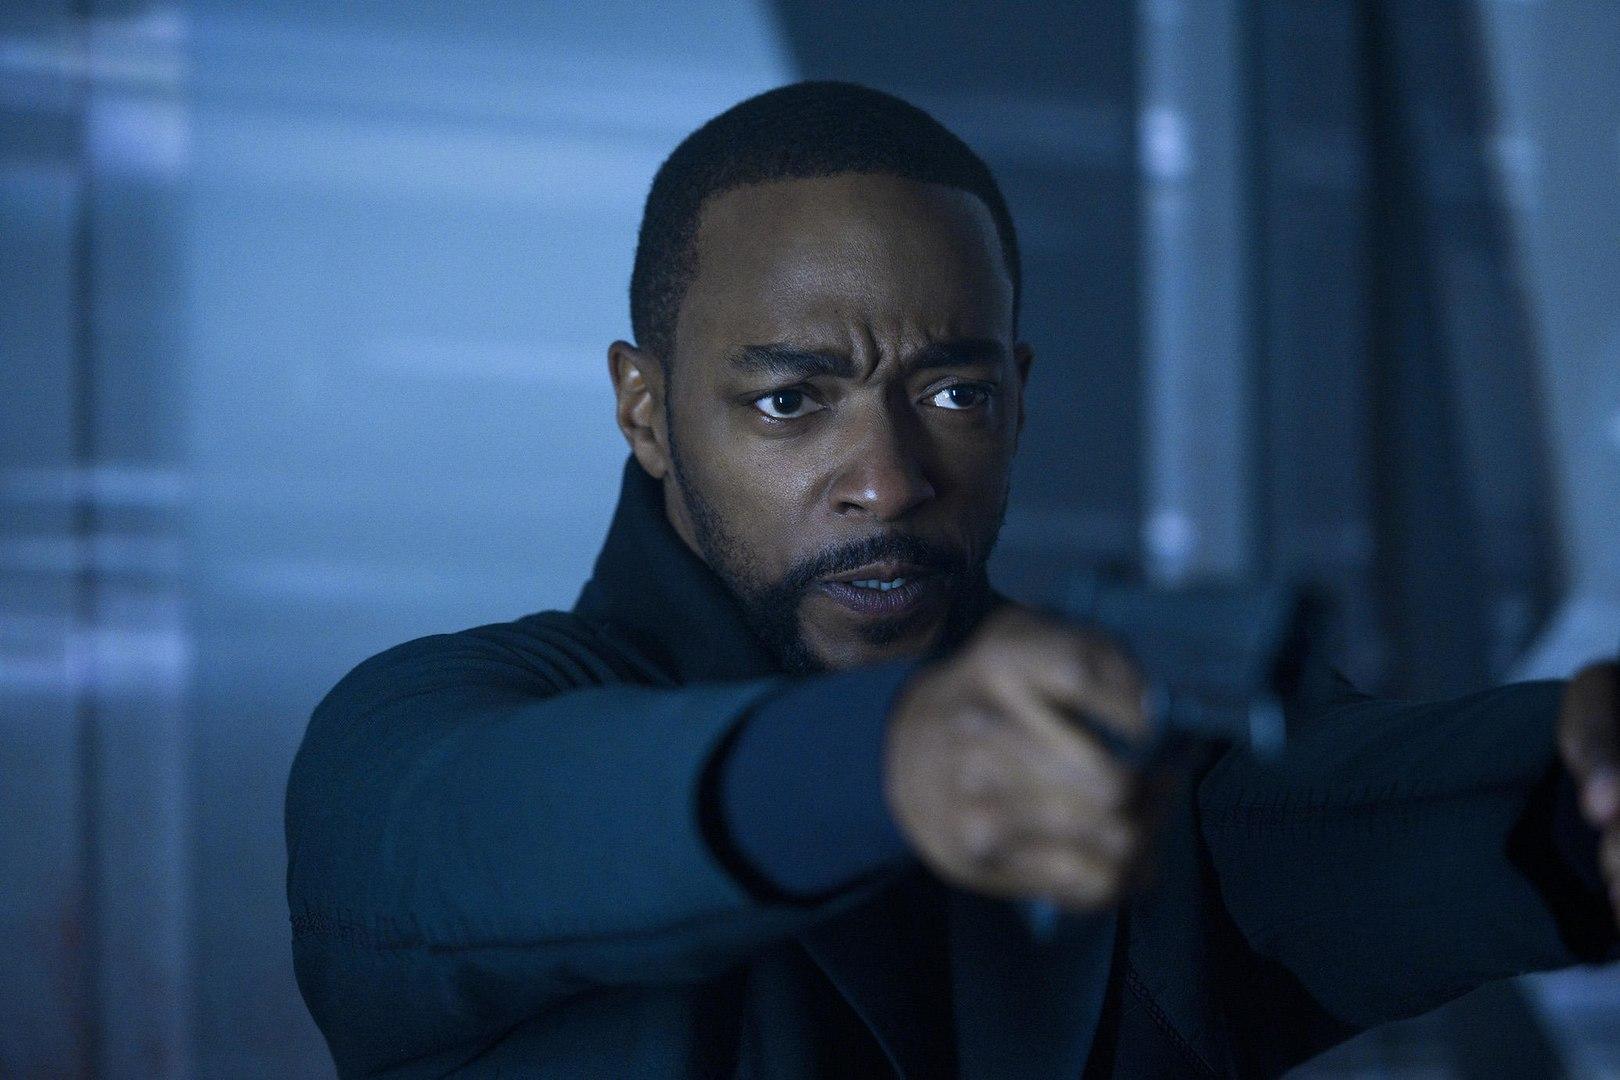 Altered Carbon season 2 - Anthony Mackie teaser - Netflix 2020